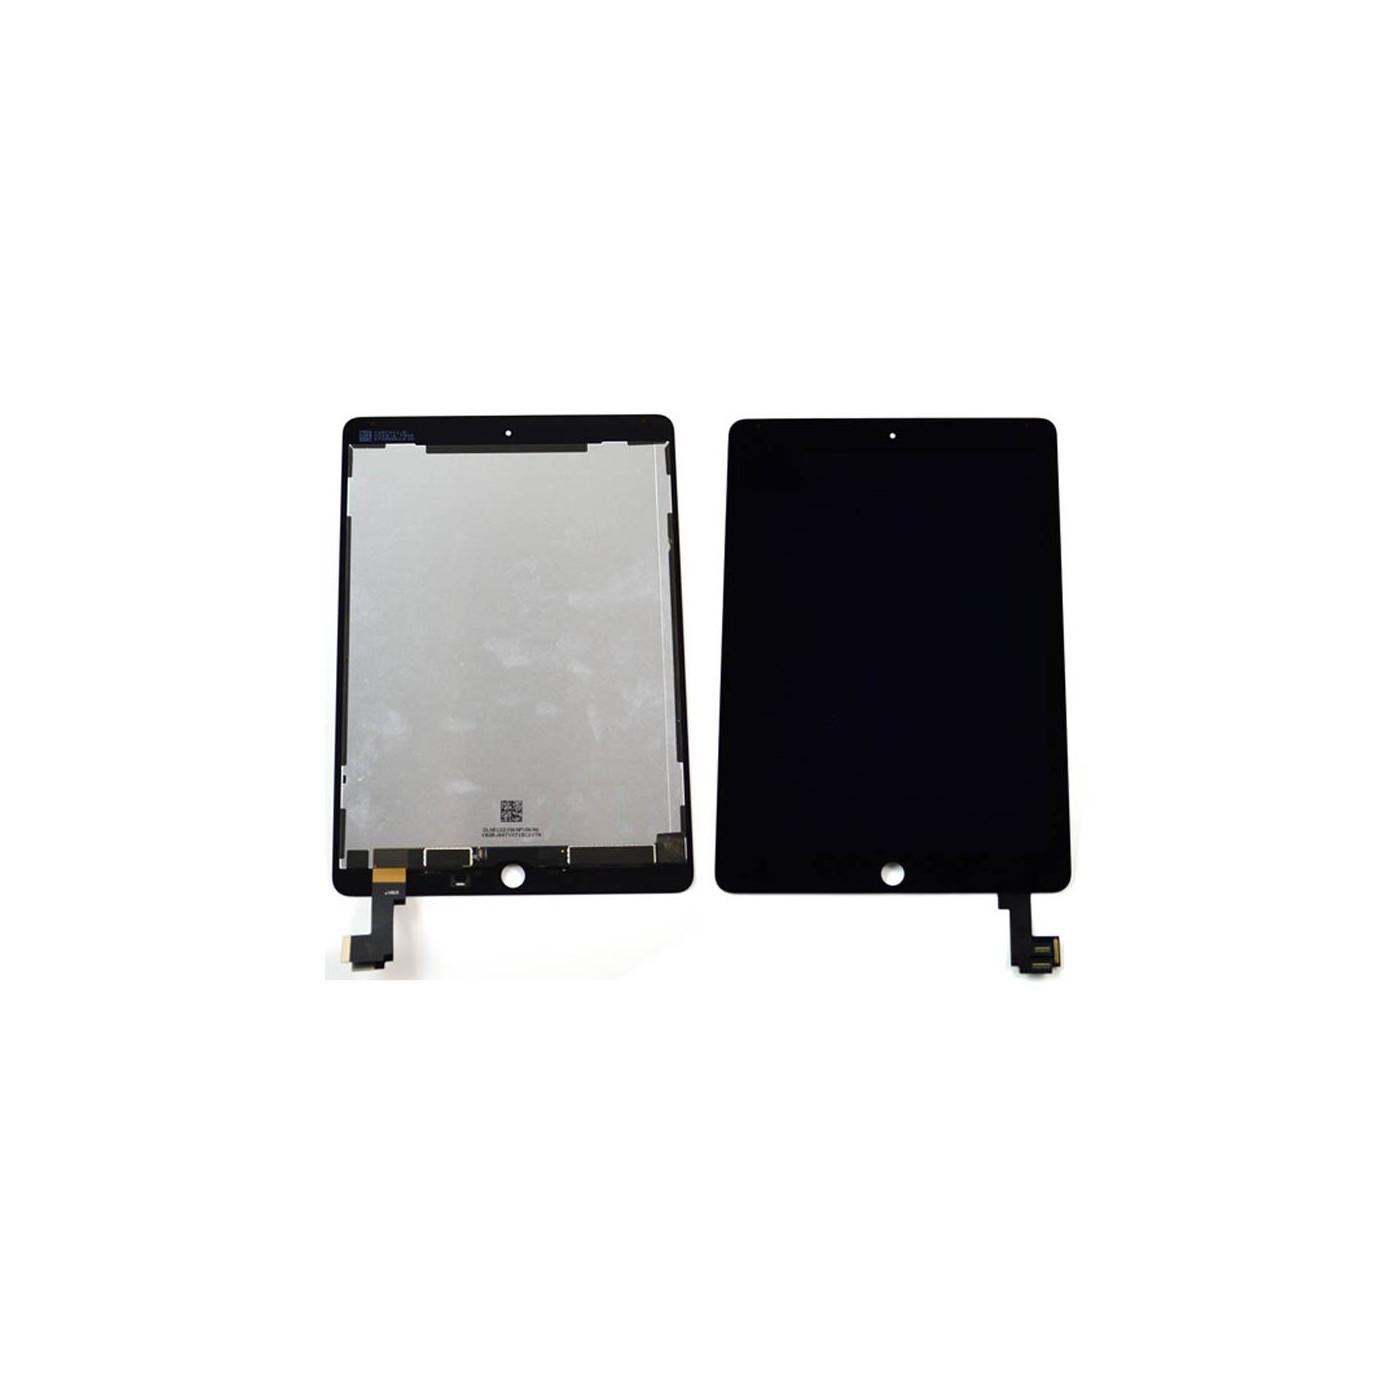 Display Lcd + Touch Screen per Apple Ipad Air 2 nero